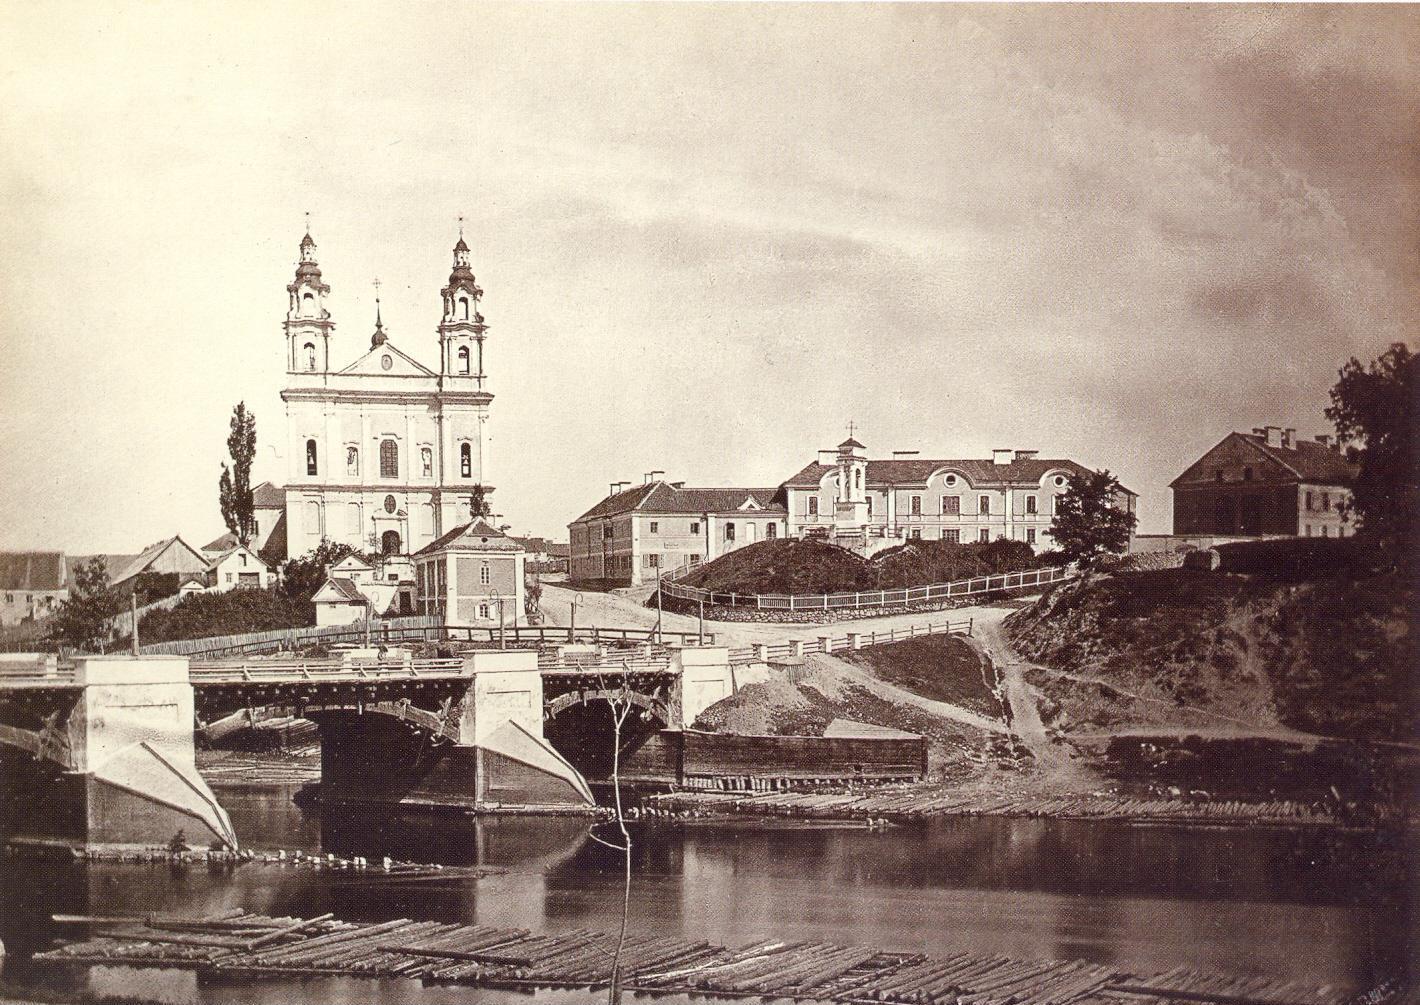 Jozefas-Cechovicius-Zaliasis-tiltas-Sv.Rapolo-baznycia-kalvele-kapai, Jėzaus koplyca.1874 m. Vilniaus fotografija 1858-1915. Vilnius 2001, p. 176.